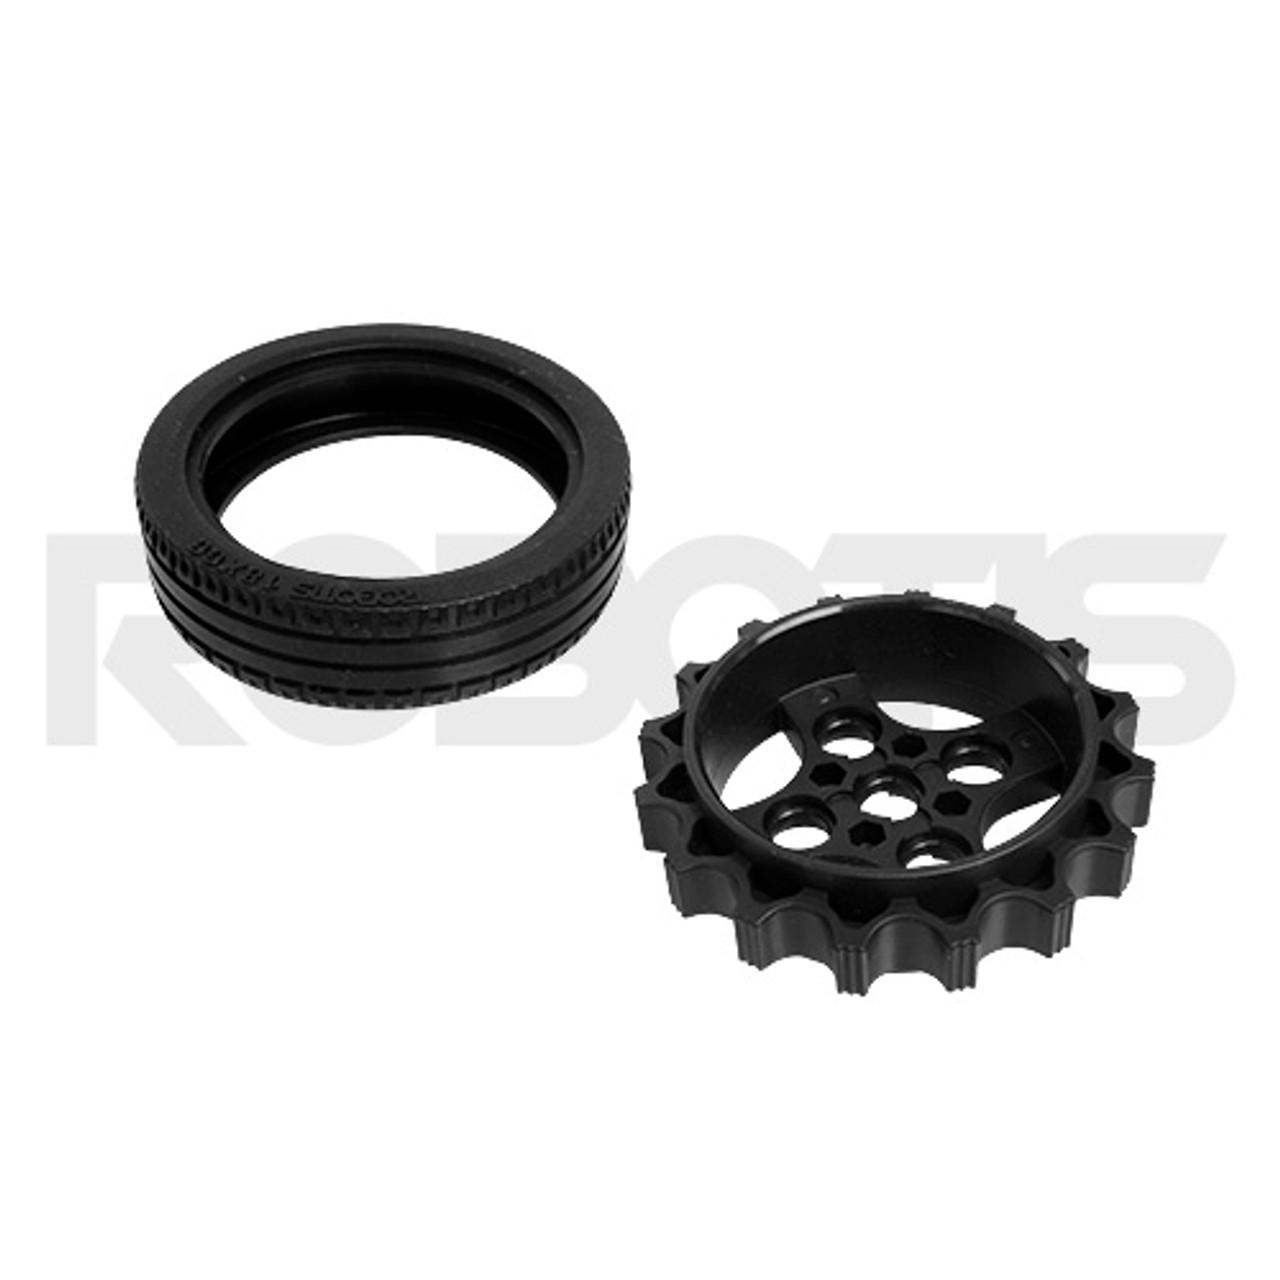 TB3 Wheel Tire Set-ISW-01 (2ea)